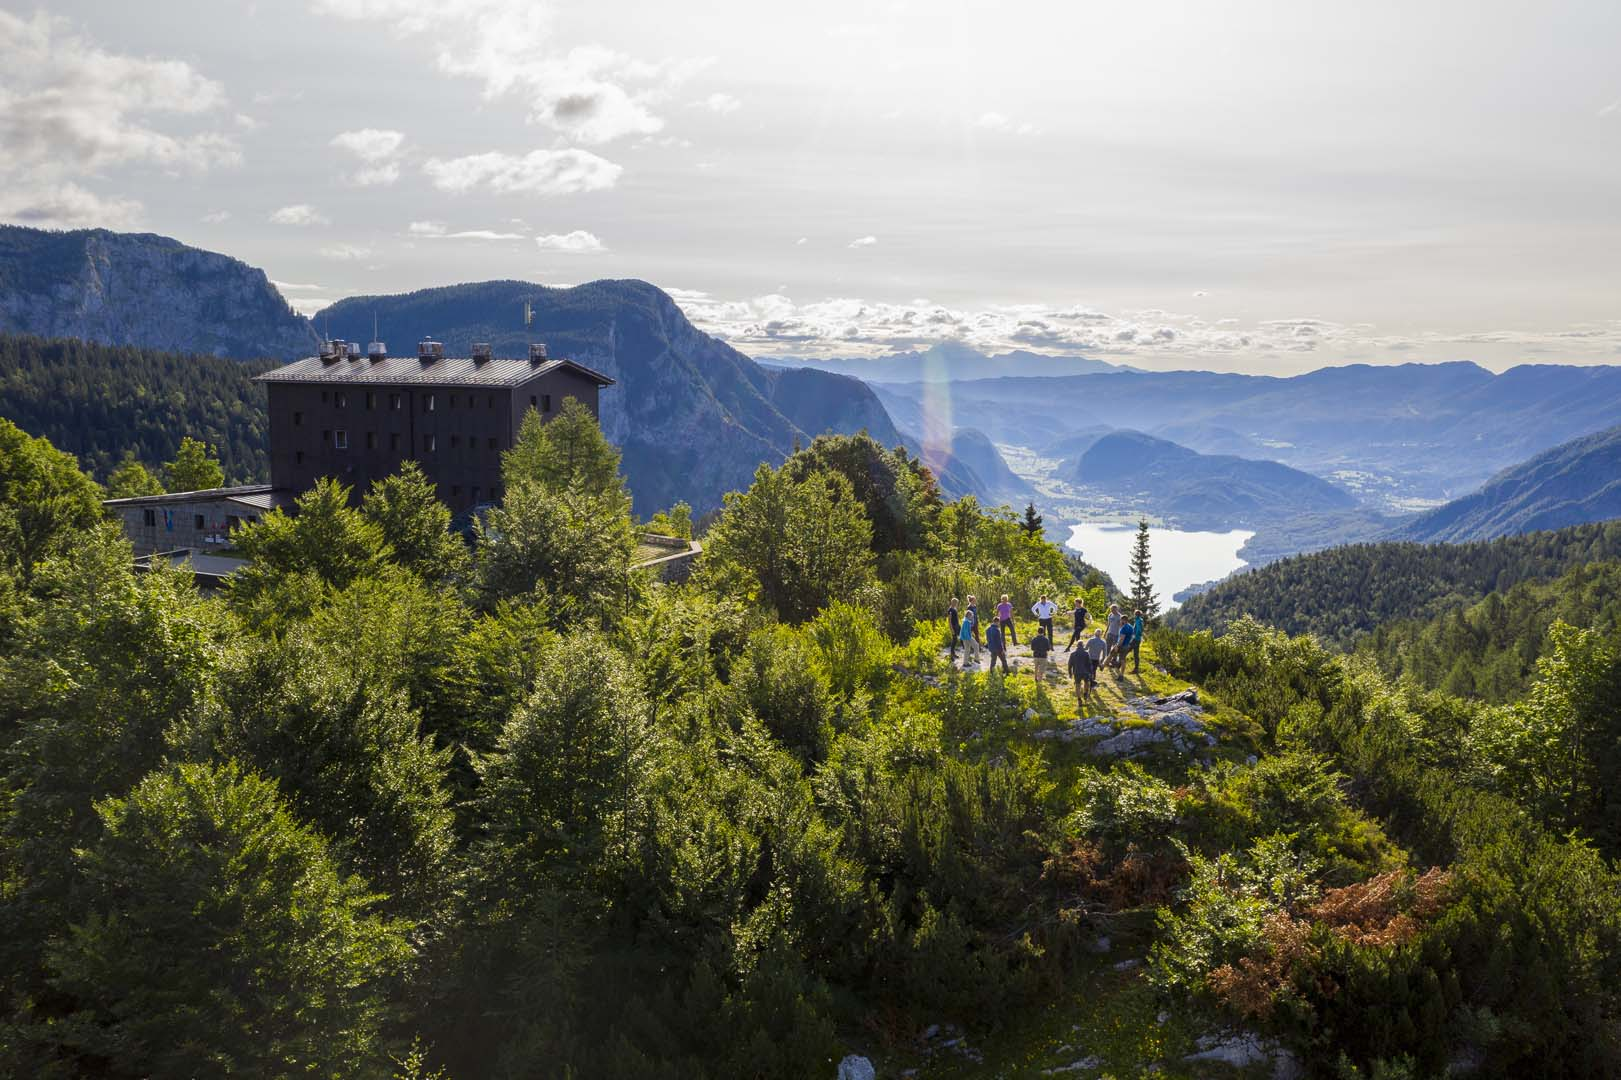 Slovenie 201907 391 HR © Peter Trimbos